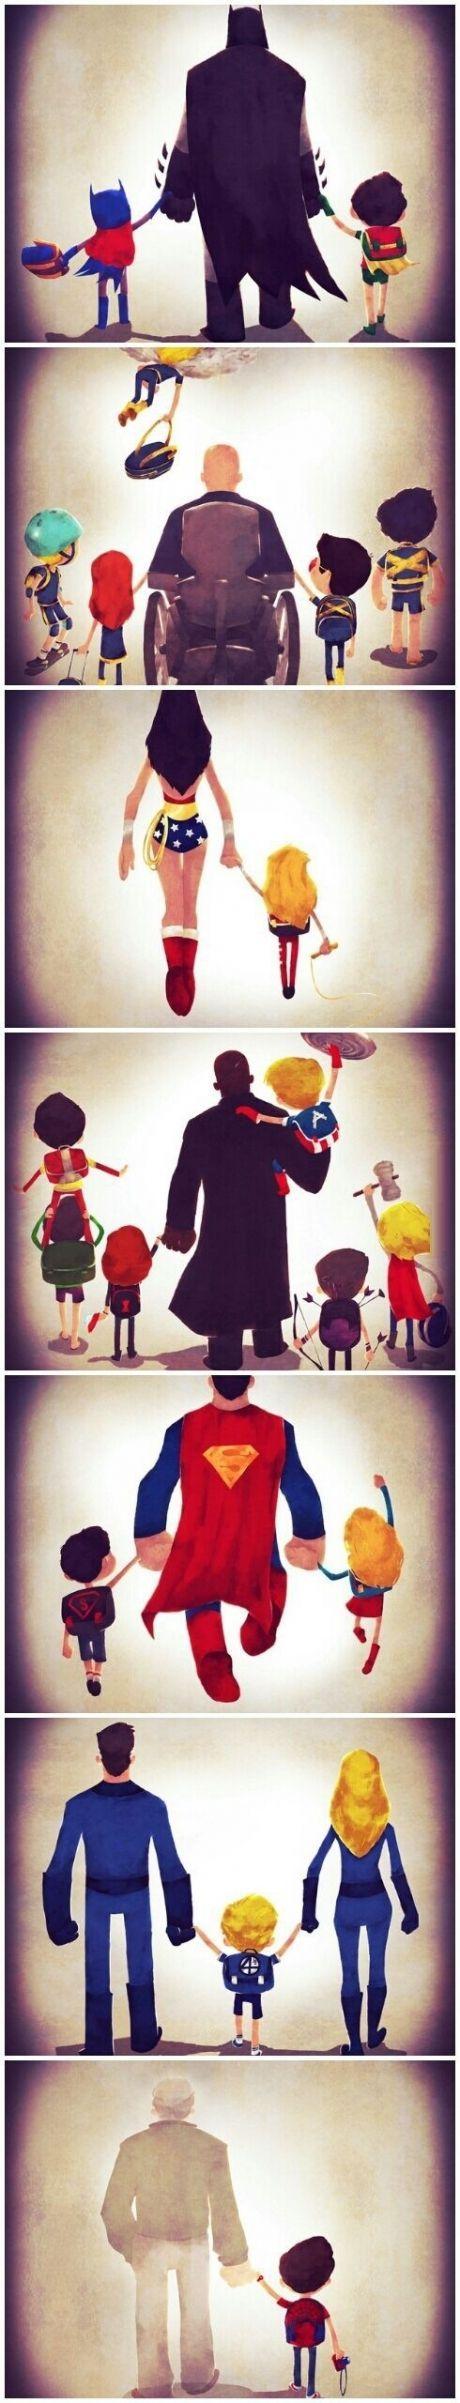 Super Families   Read More Funny:    http://wdb.es/?utm_campaign=wdb.es&utm_medium=pinterest&utm_source=pinterst-description&utm_content=&utm_term=